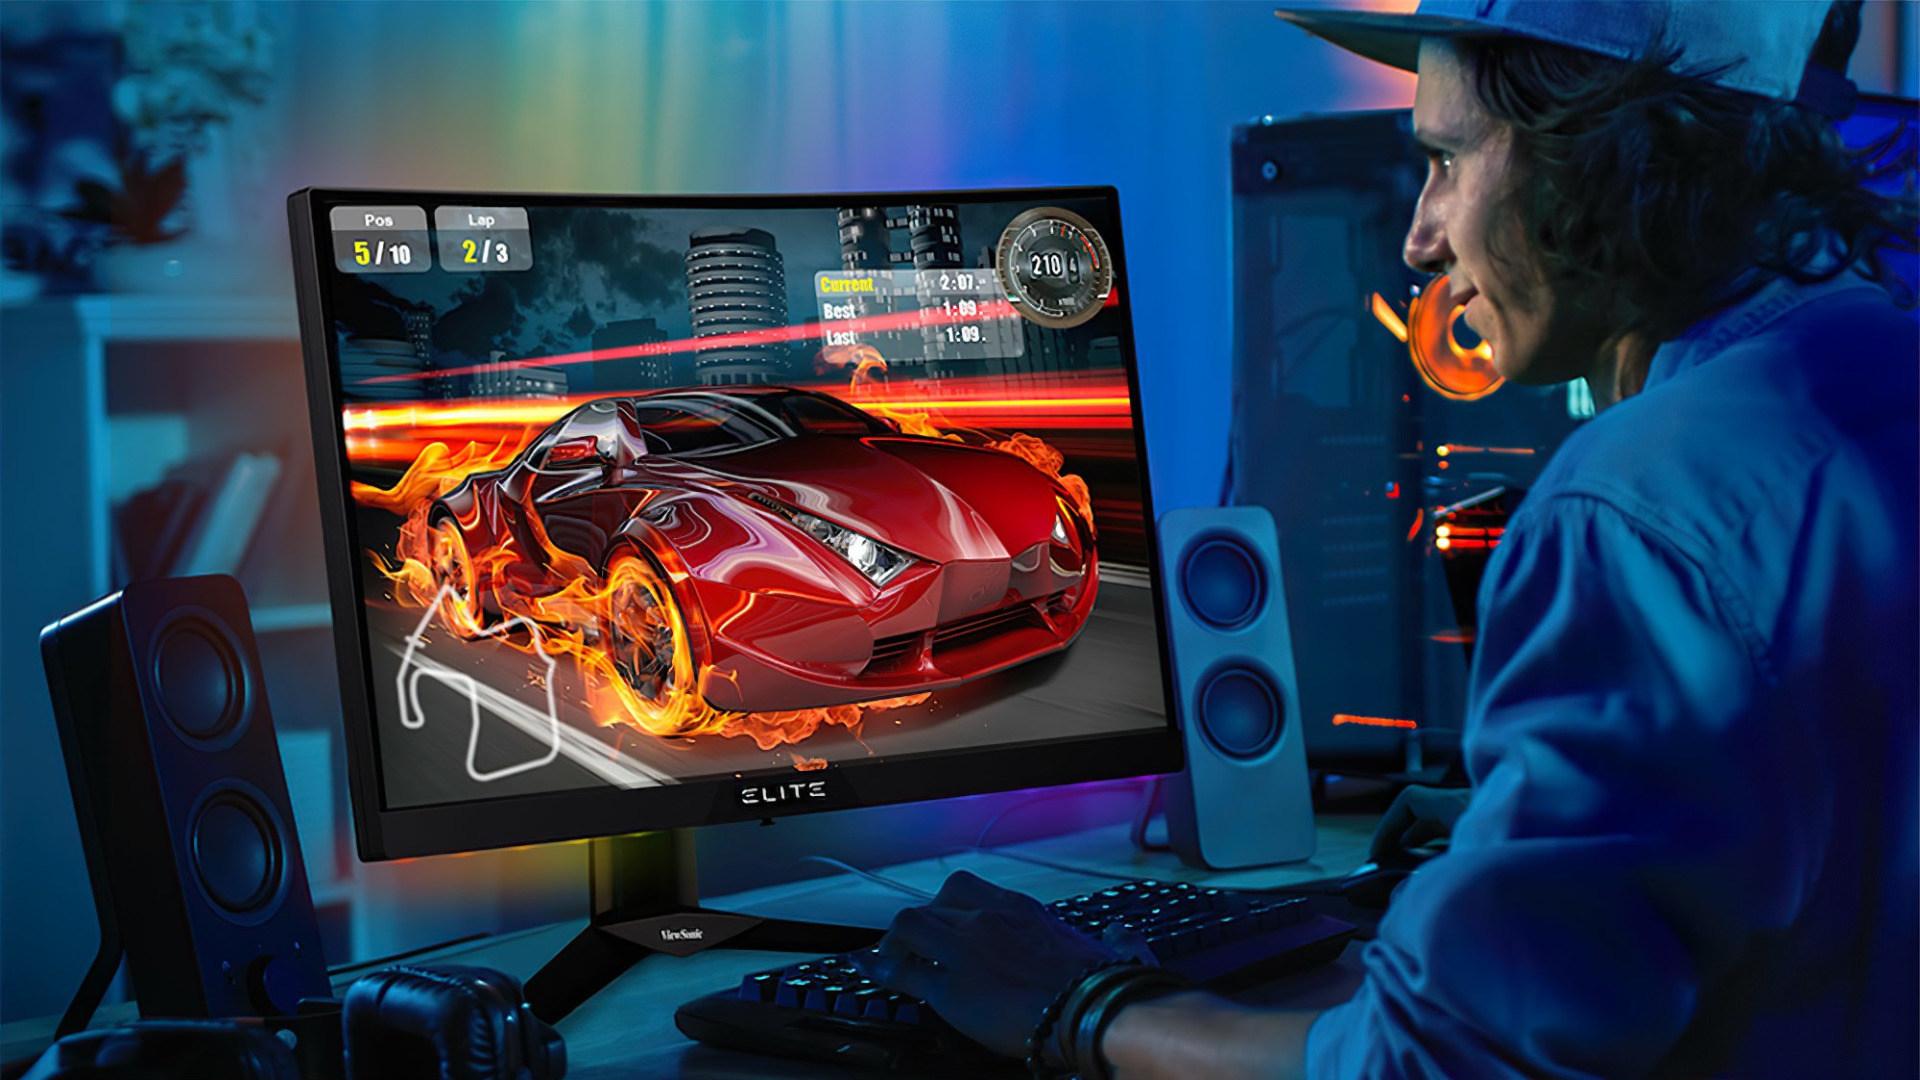 Gaming, Spiele, Games, Display, Monitor, Spieler, Gamer, PC-Gaming, Viewsonic